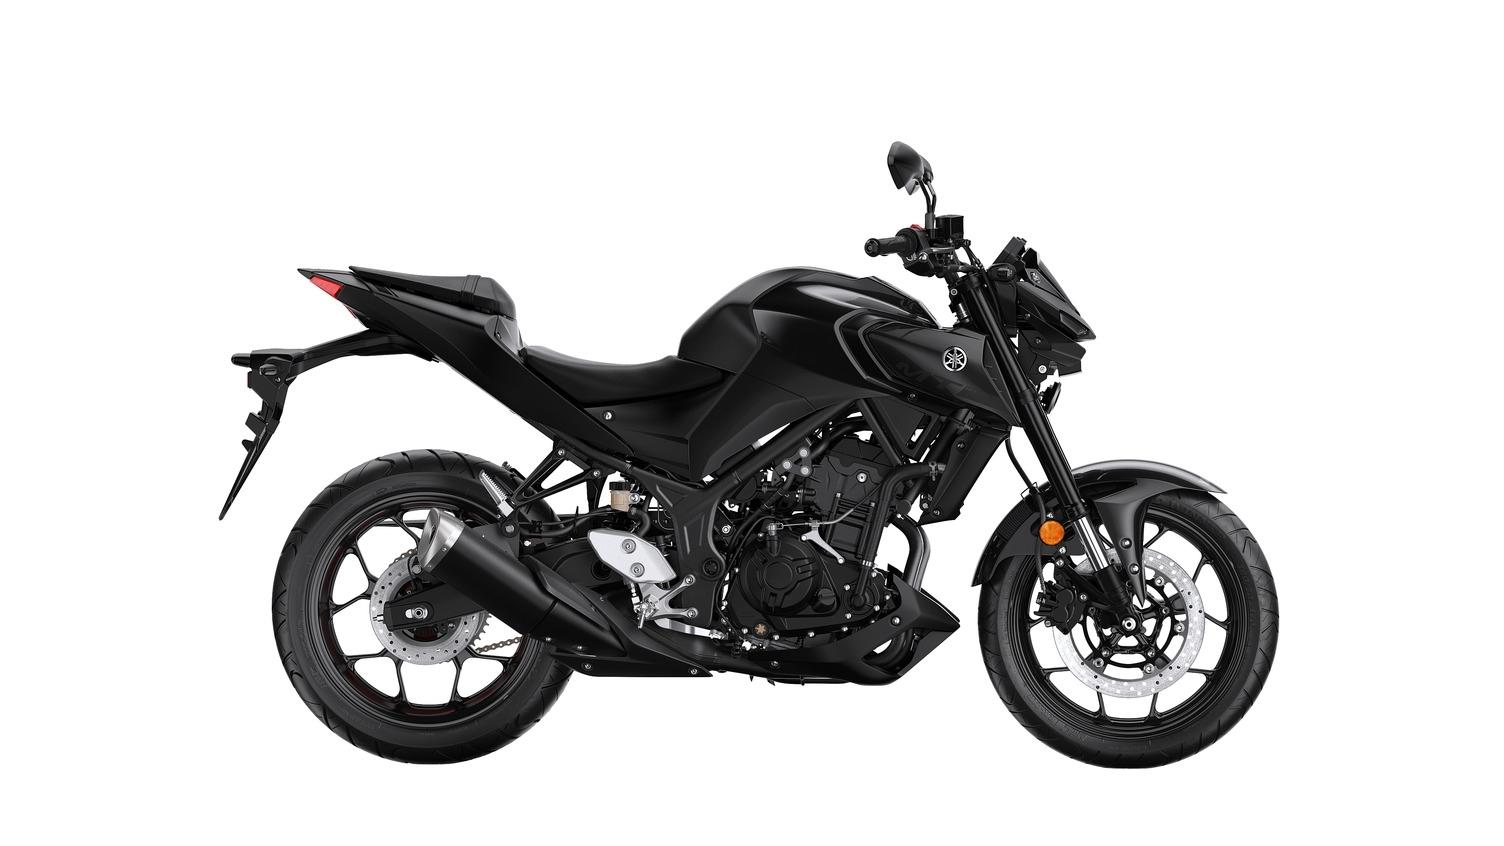 Yamaha MT-03 tech black